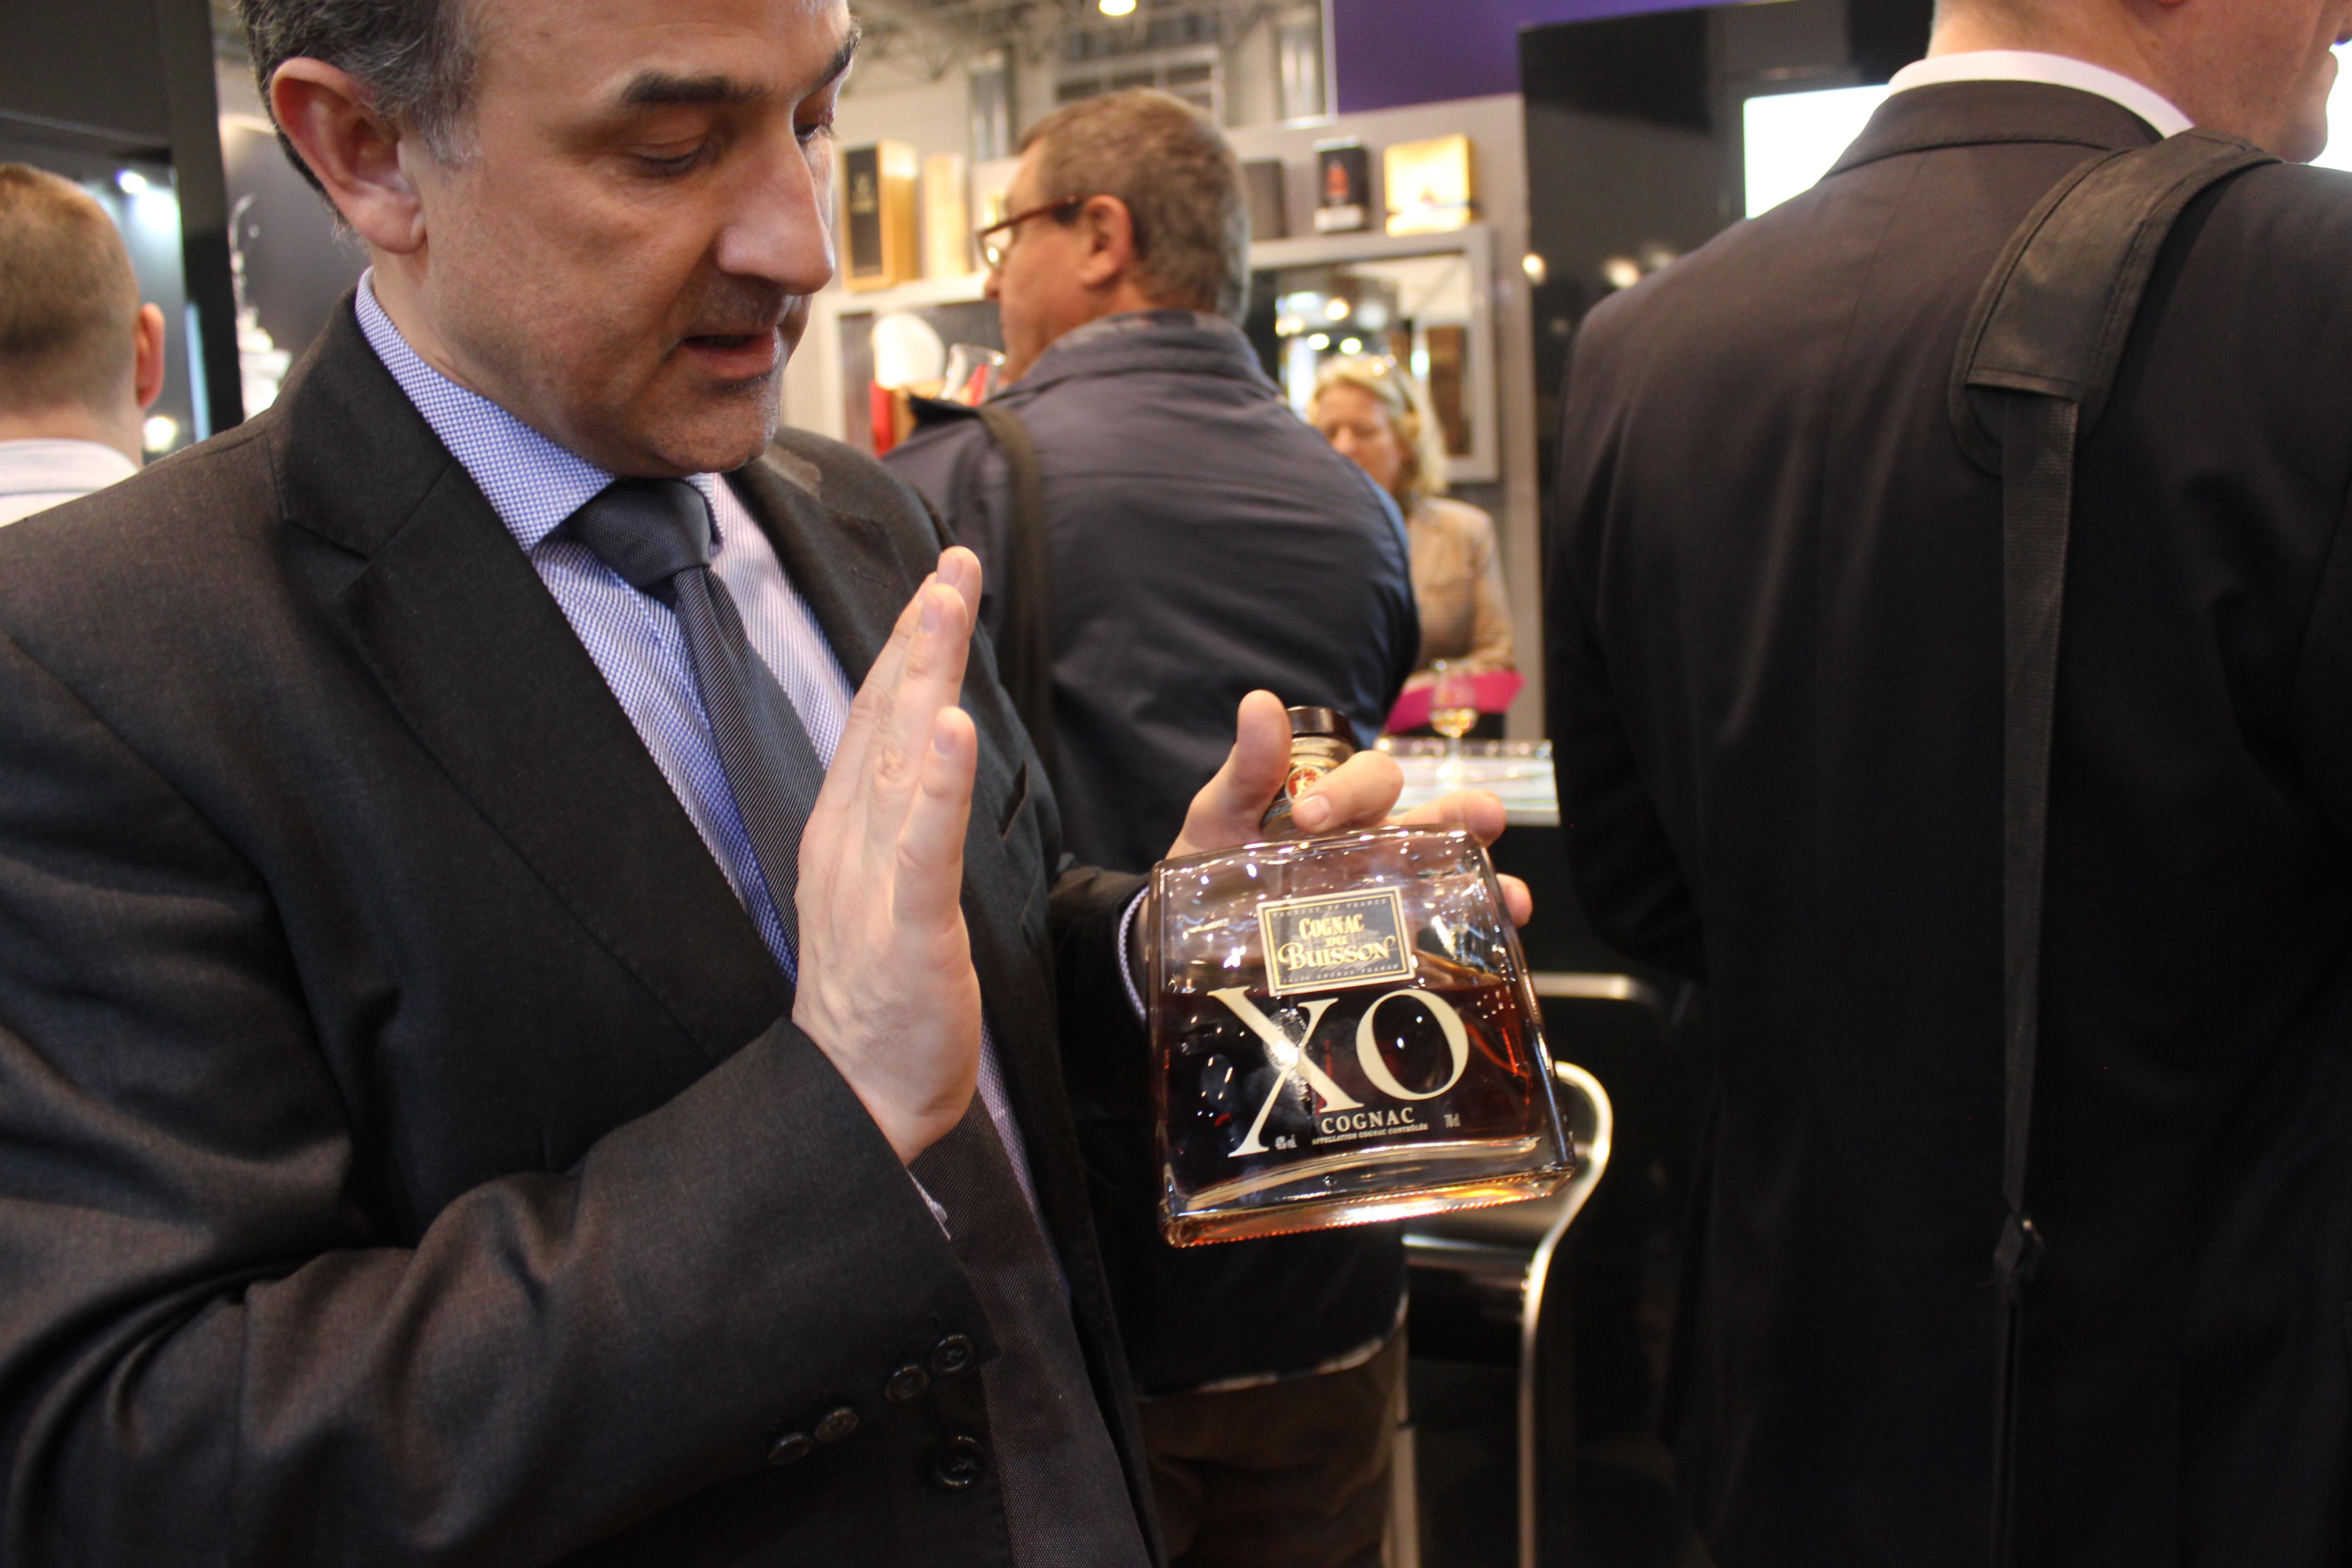 Jérôme Tessendier presenting the Buisson XO cognac